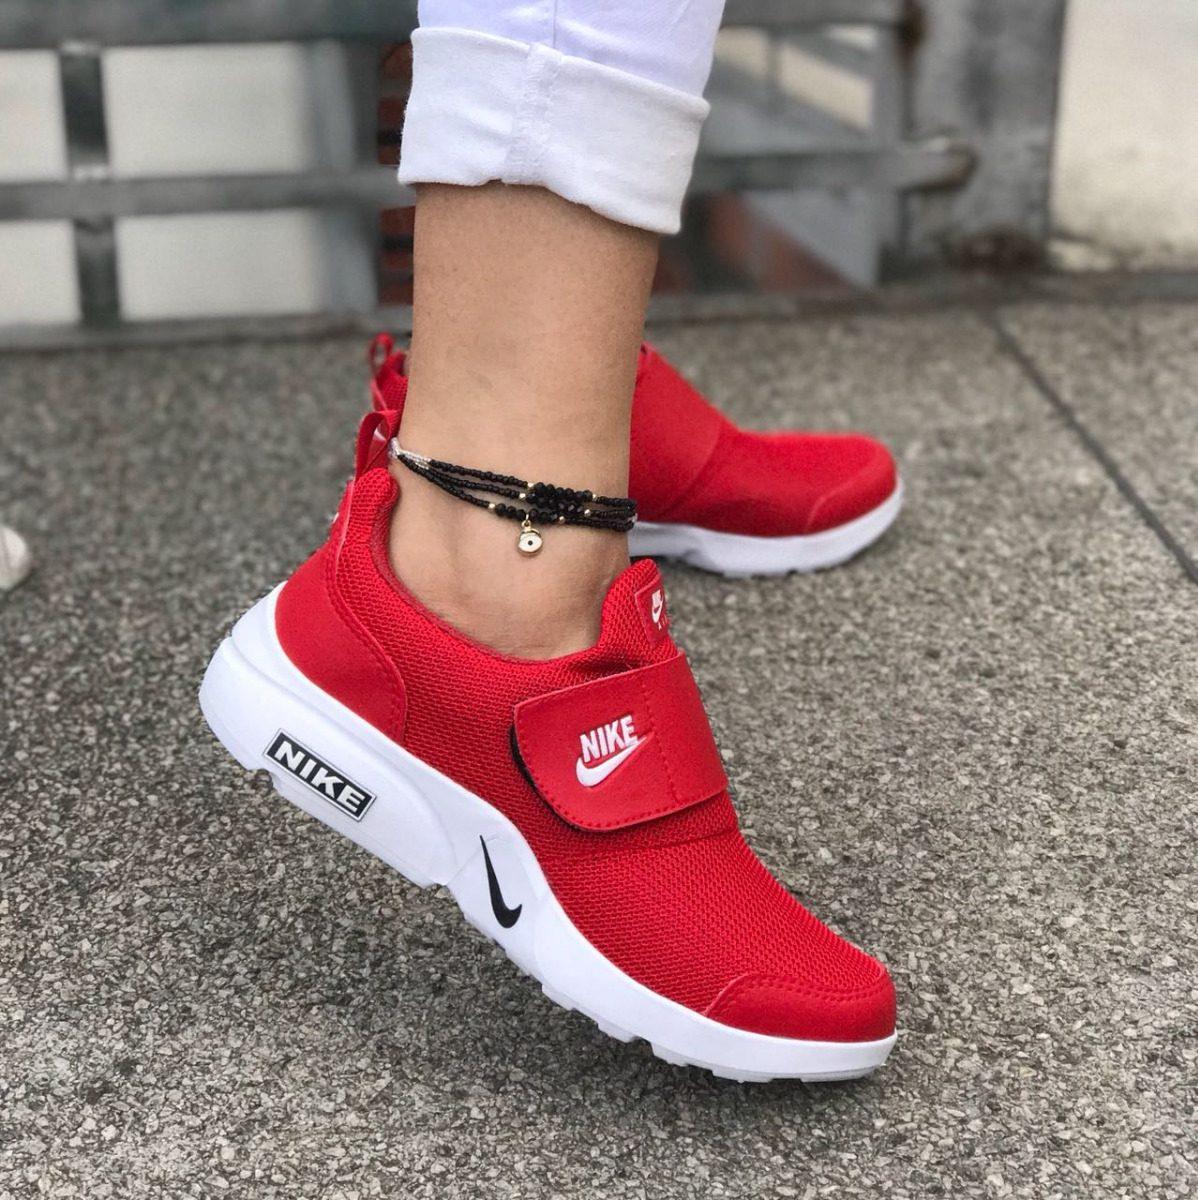 Tenis Nike Mujer Nike Lunar Apparent Negro y Blanco – Geared Media